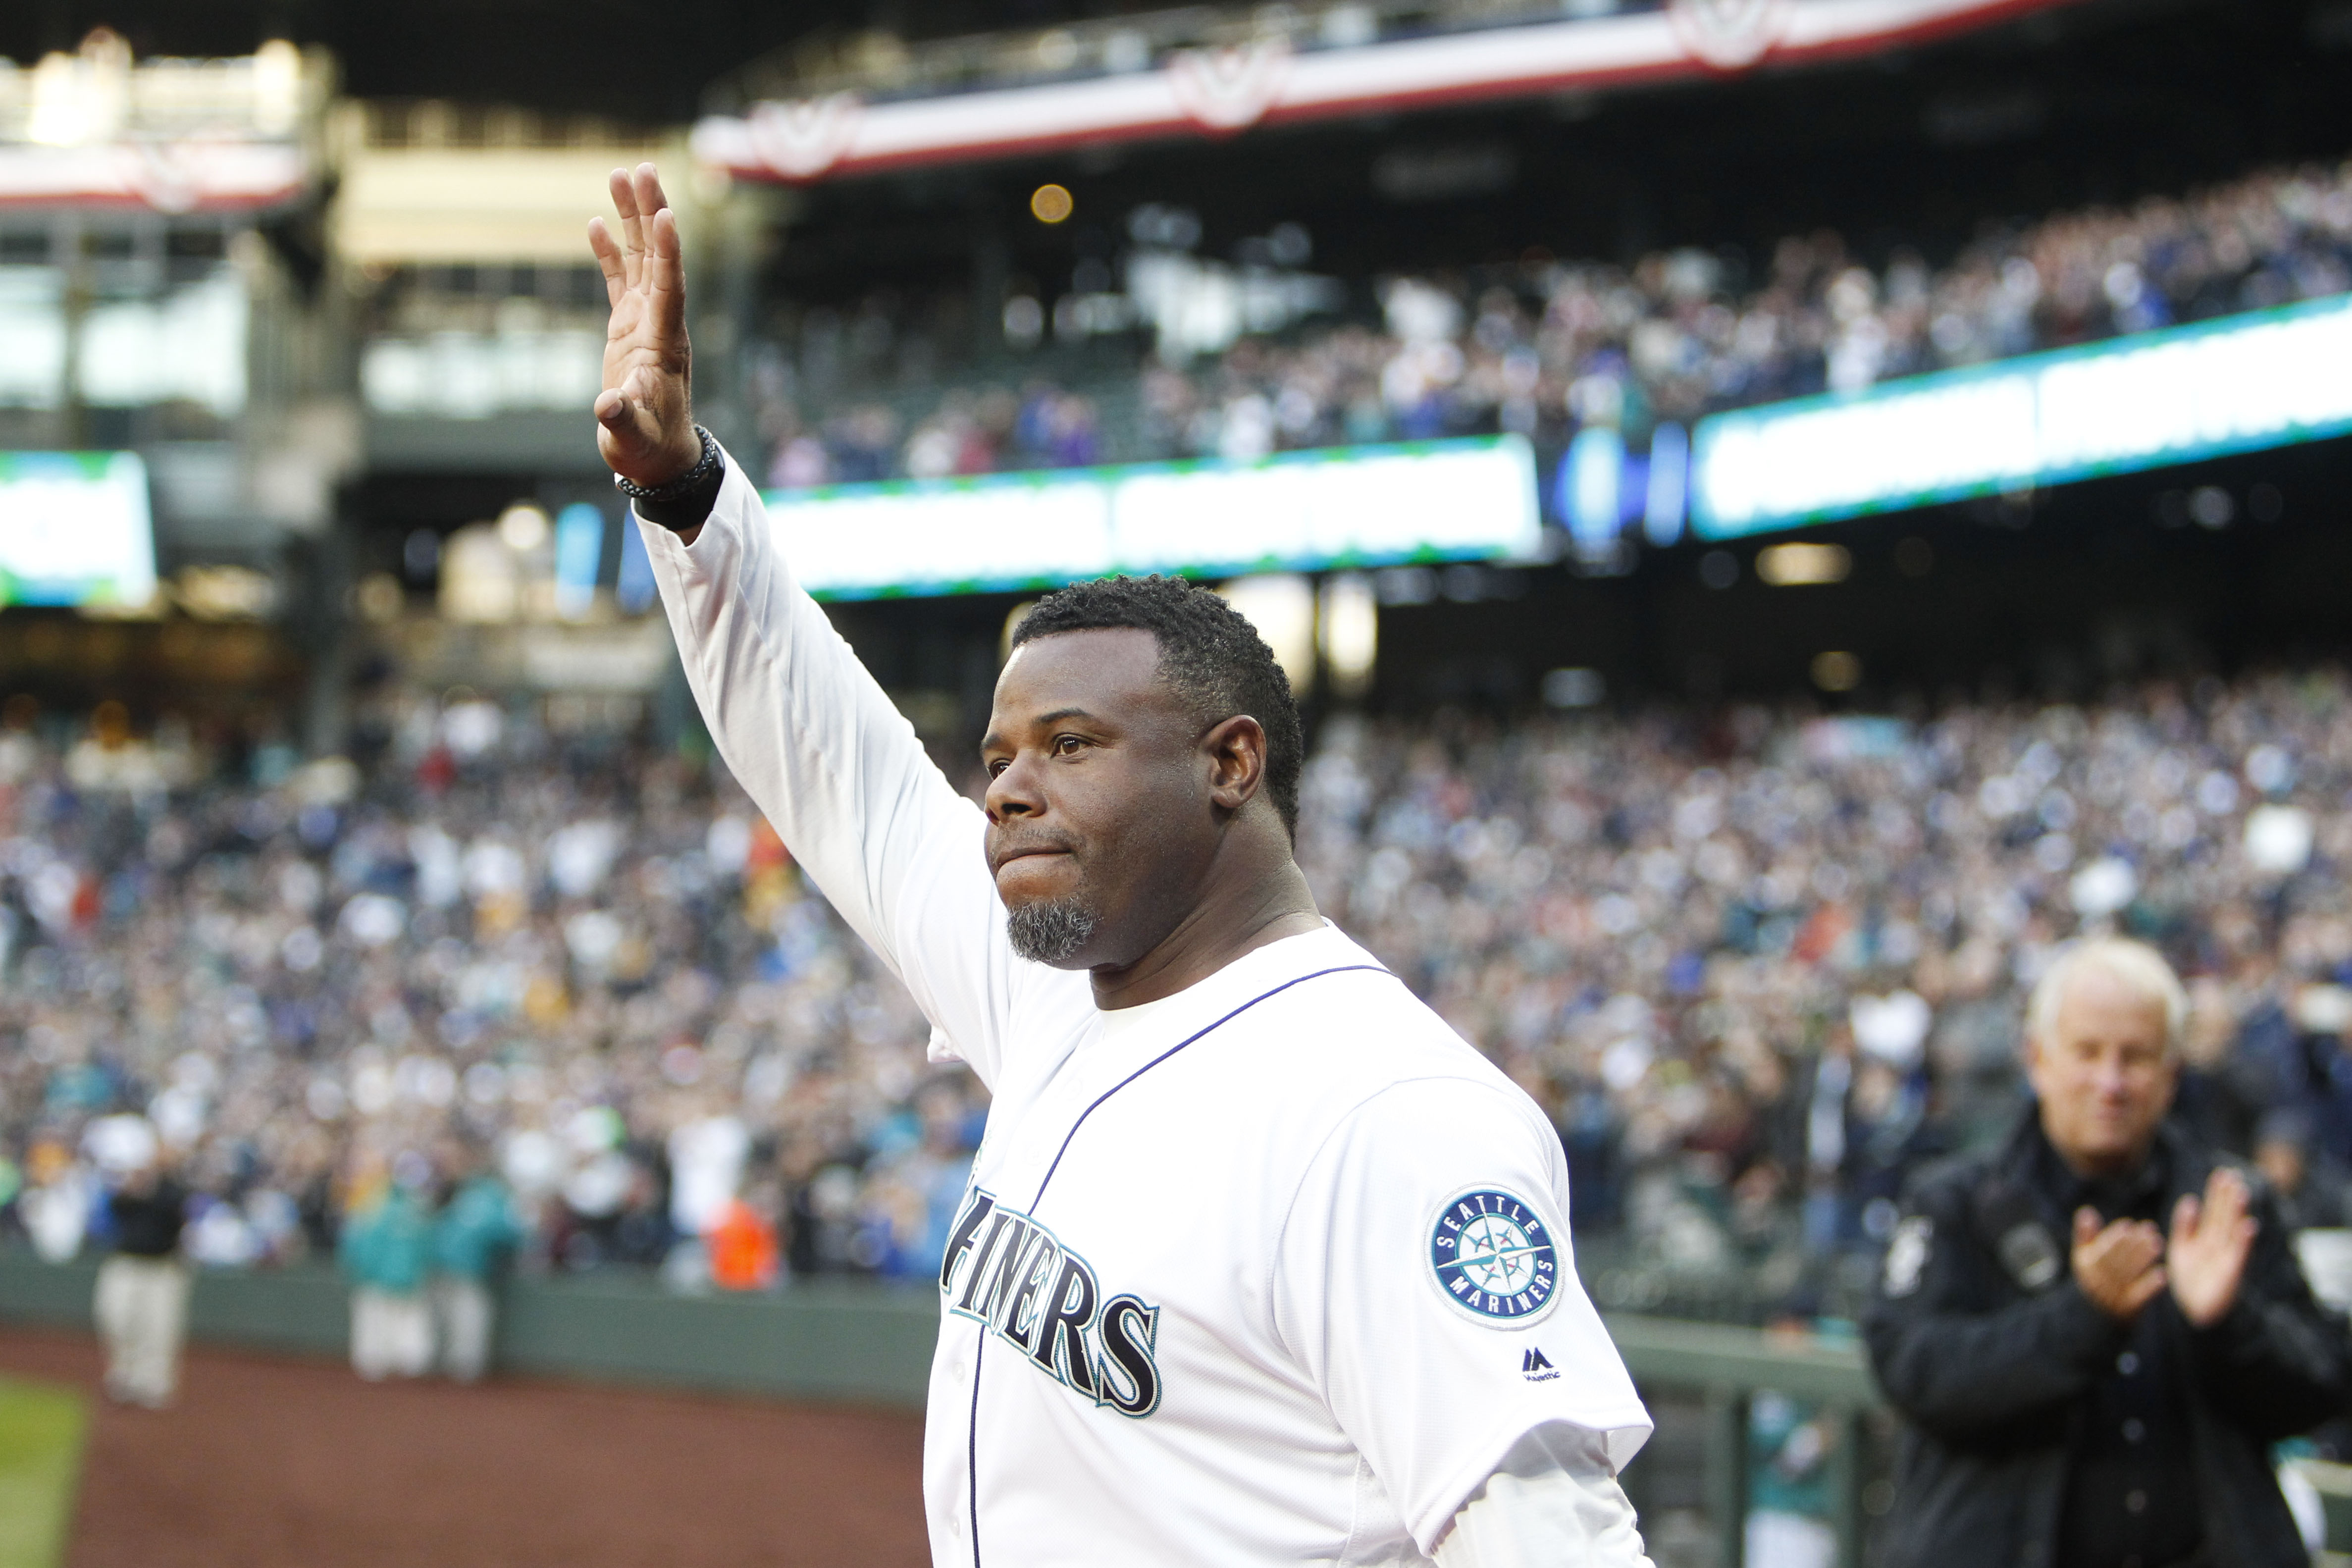 MLB: The ultimate father-son baseball game